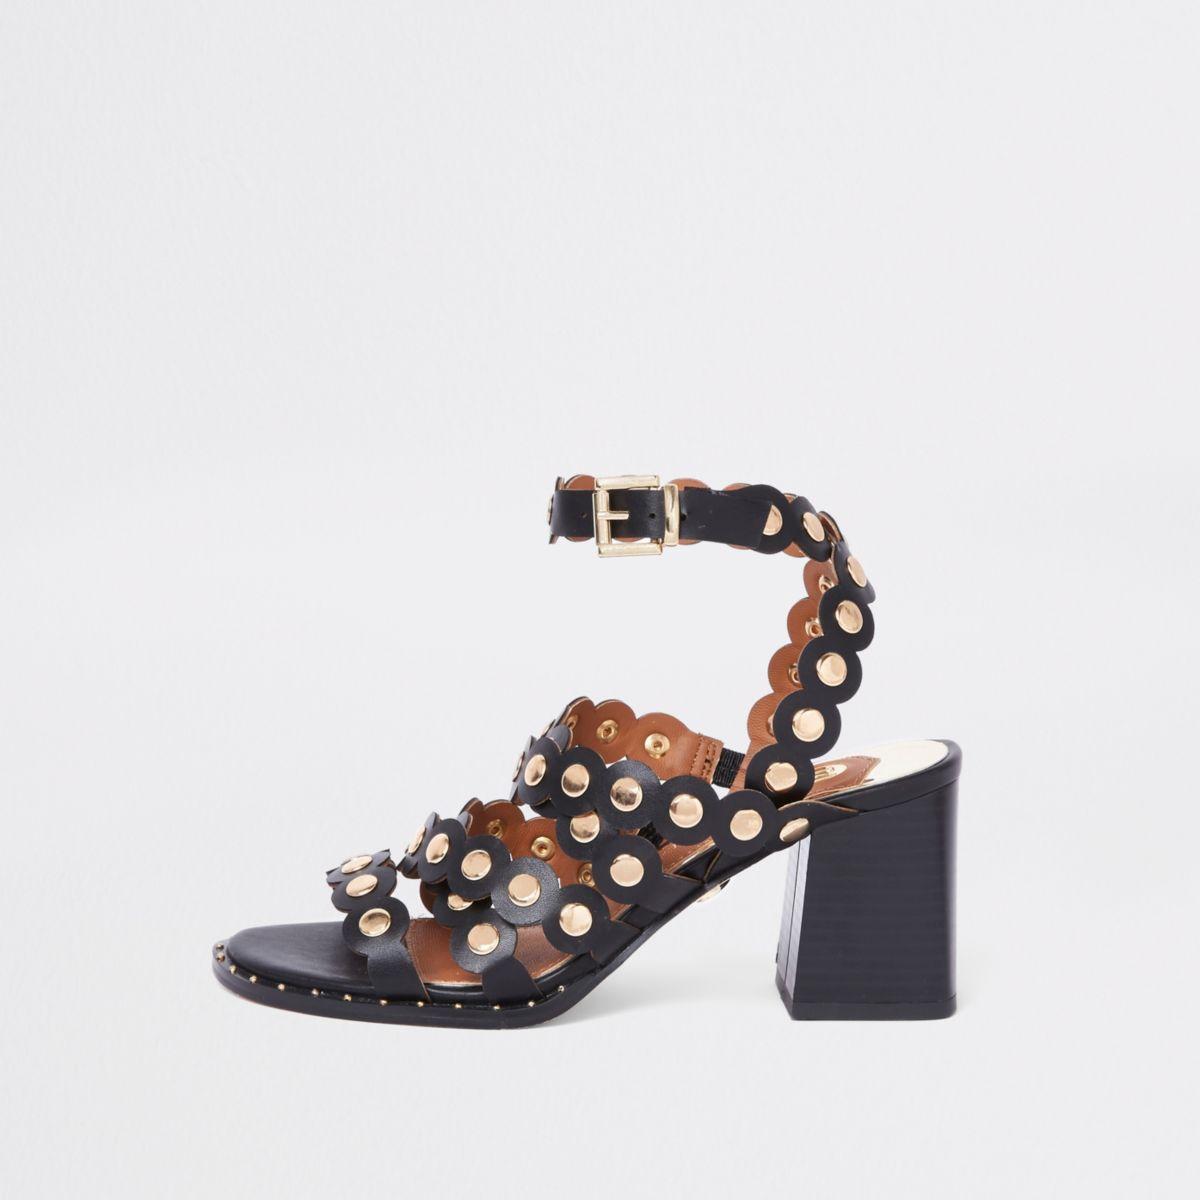 Zwarte geschulpte sandalen met blokhak